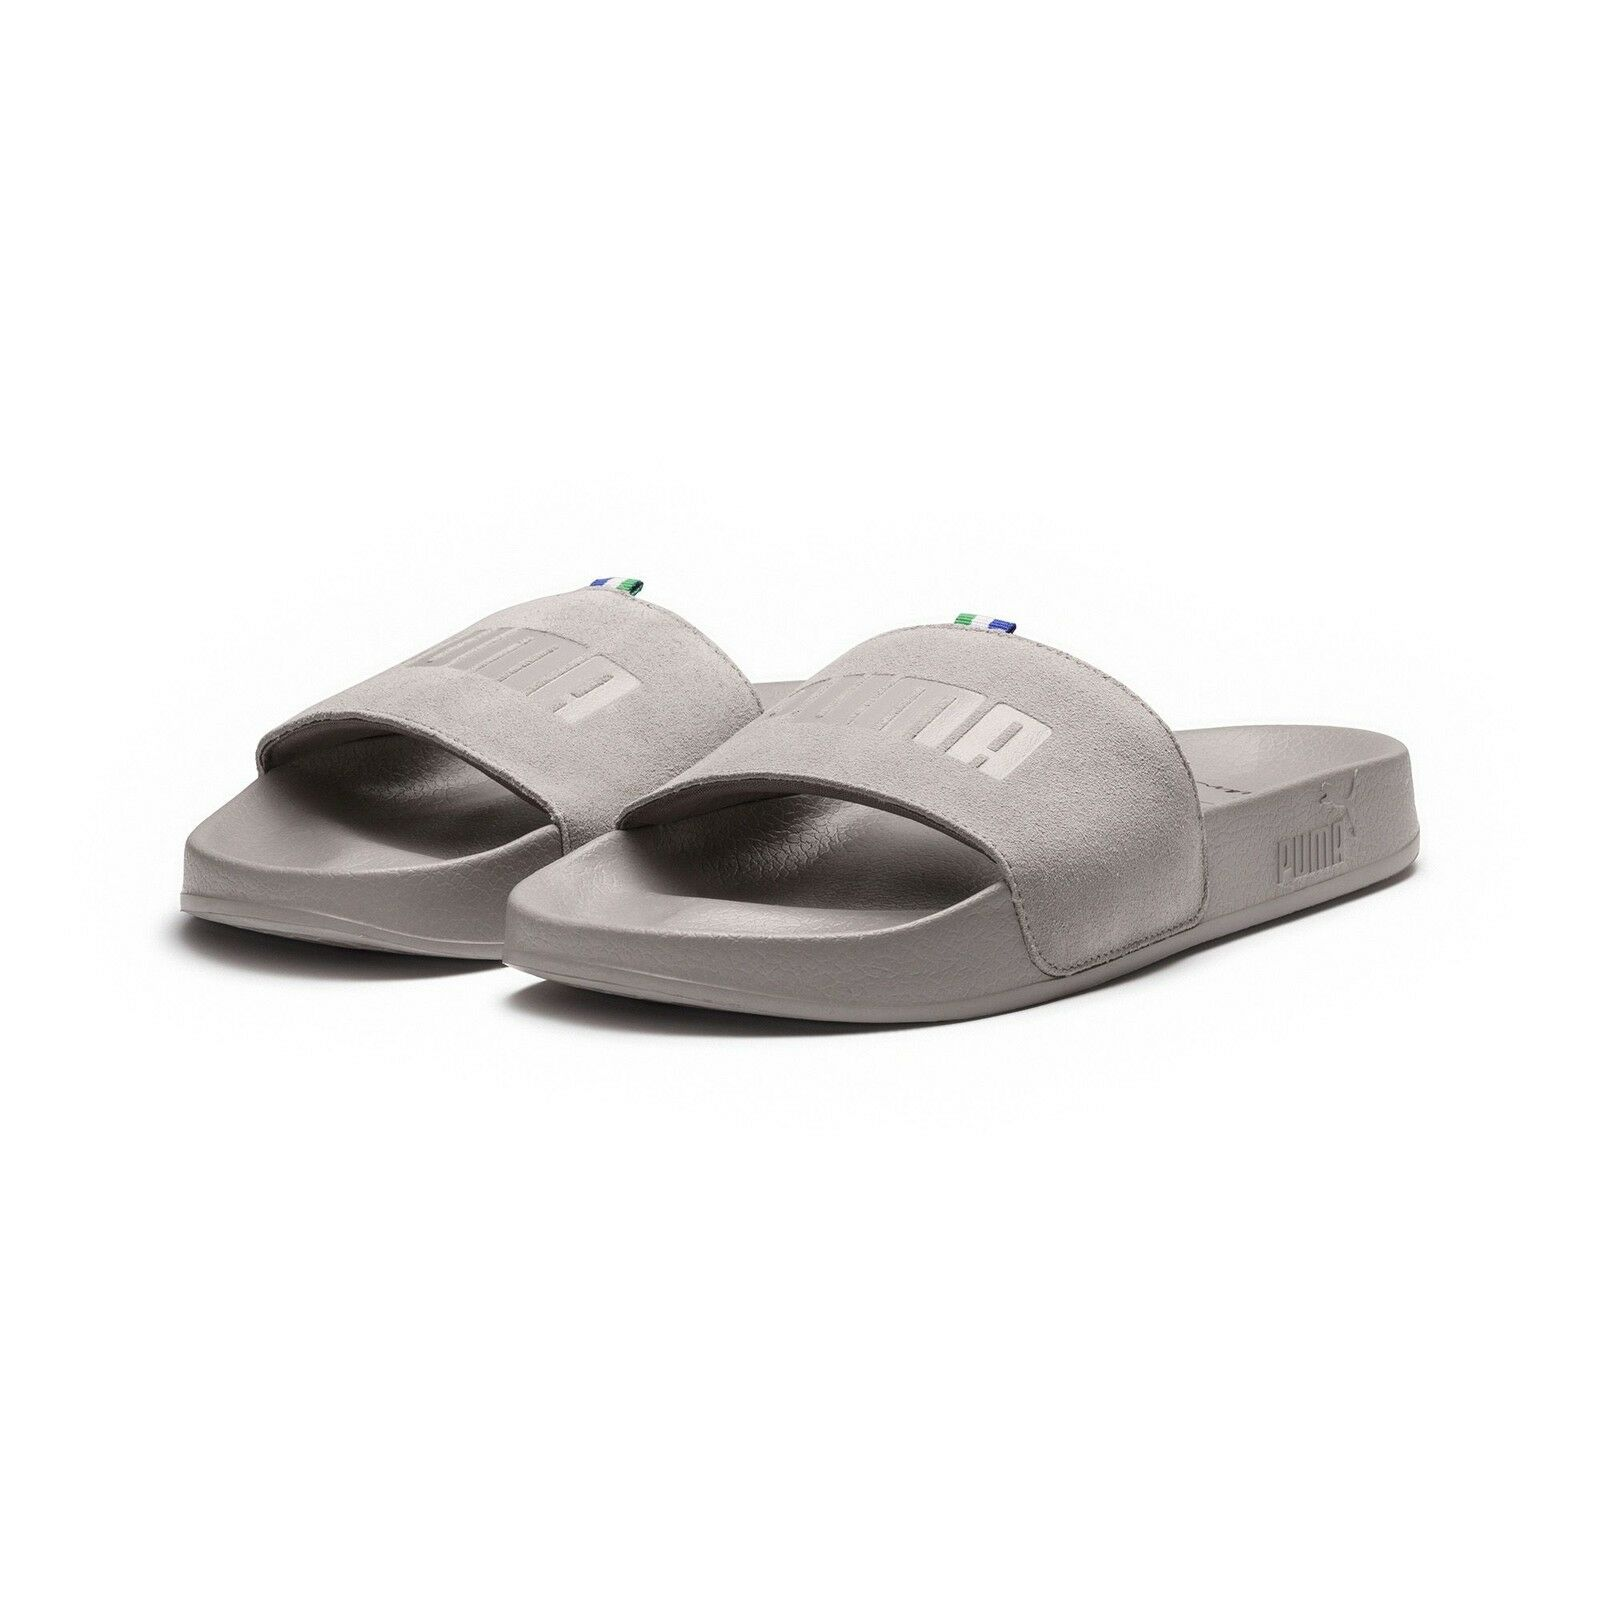 Puma Leadcat X Big Sean Ash Men Sandal Slides New Limited Edition 366296-01